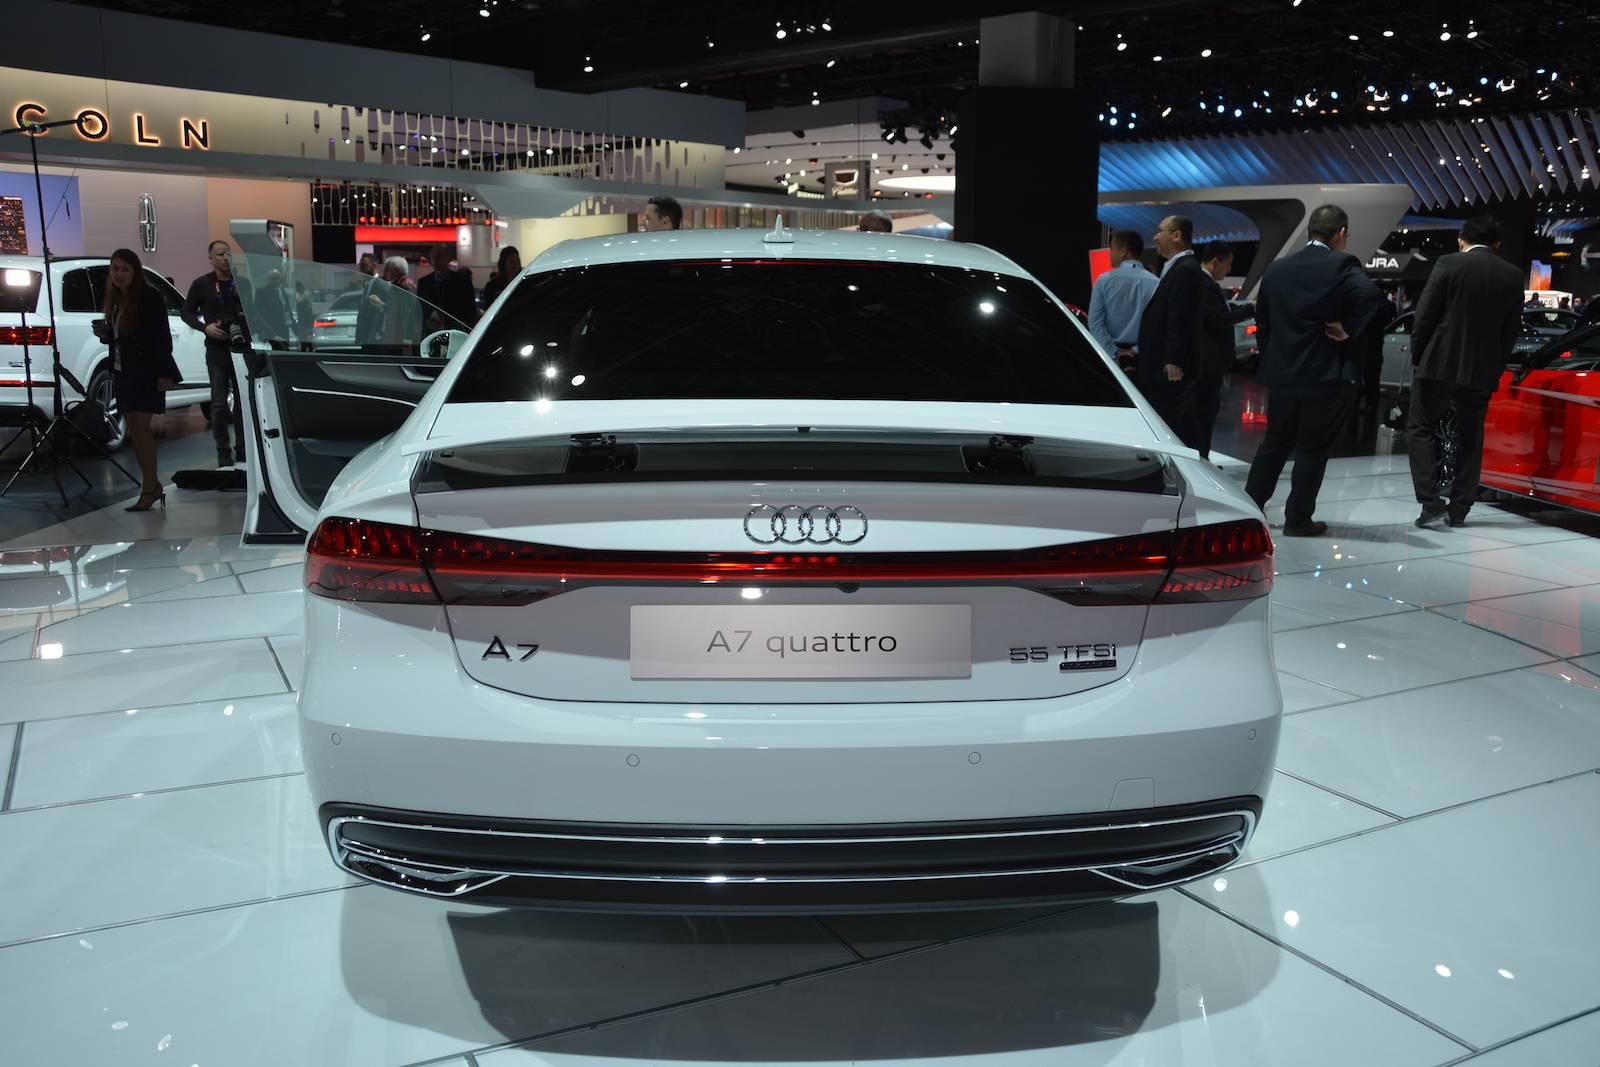 Audi A7 3.0 T >> Detroit 2018: Audi A7 Sportback - GTspirit